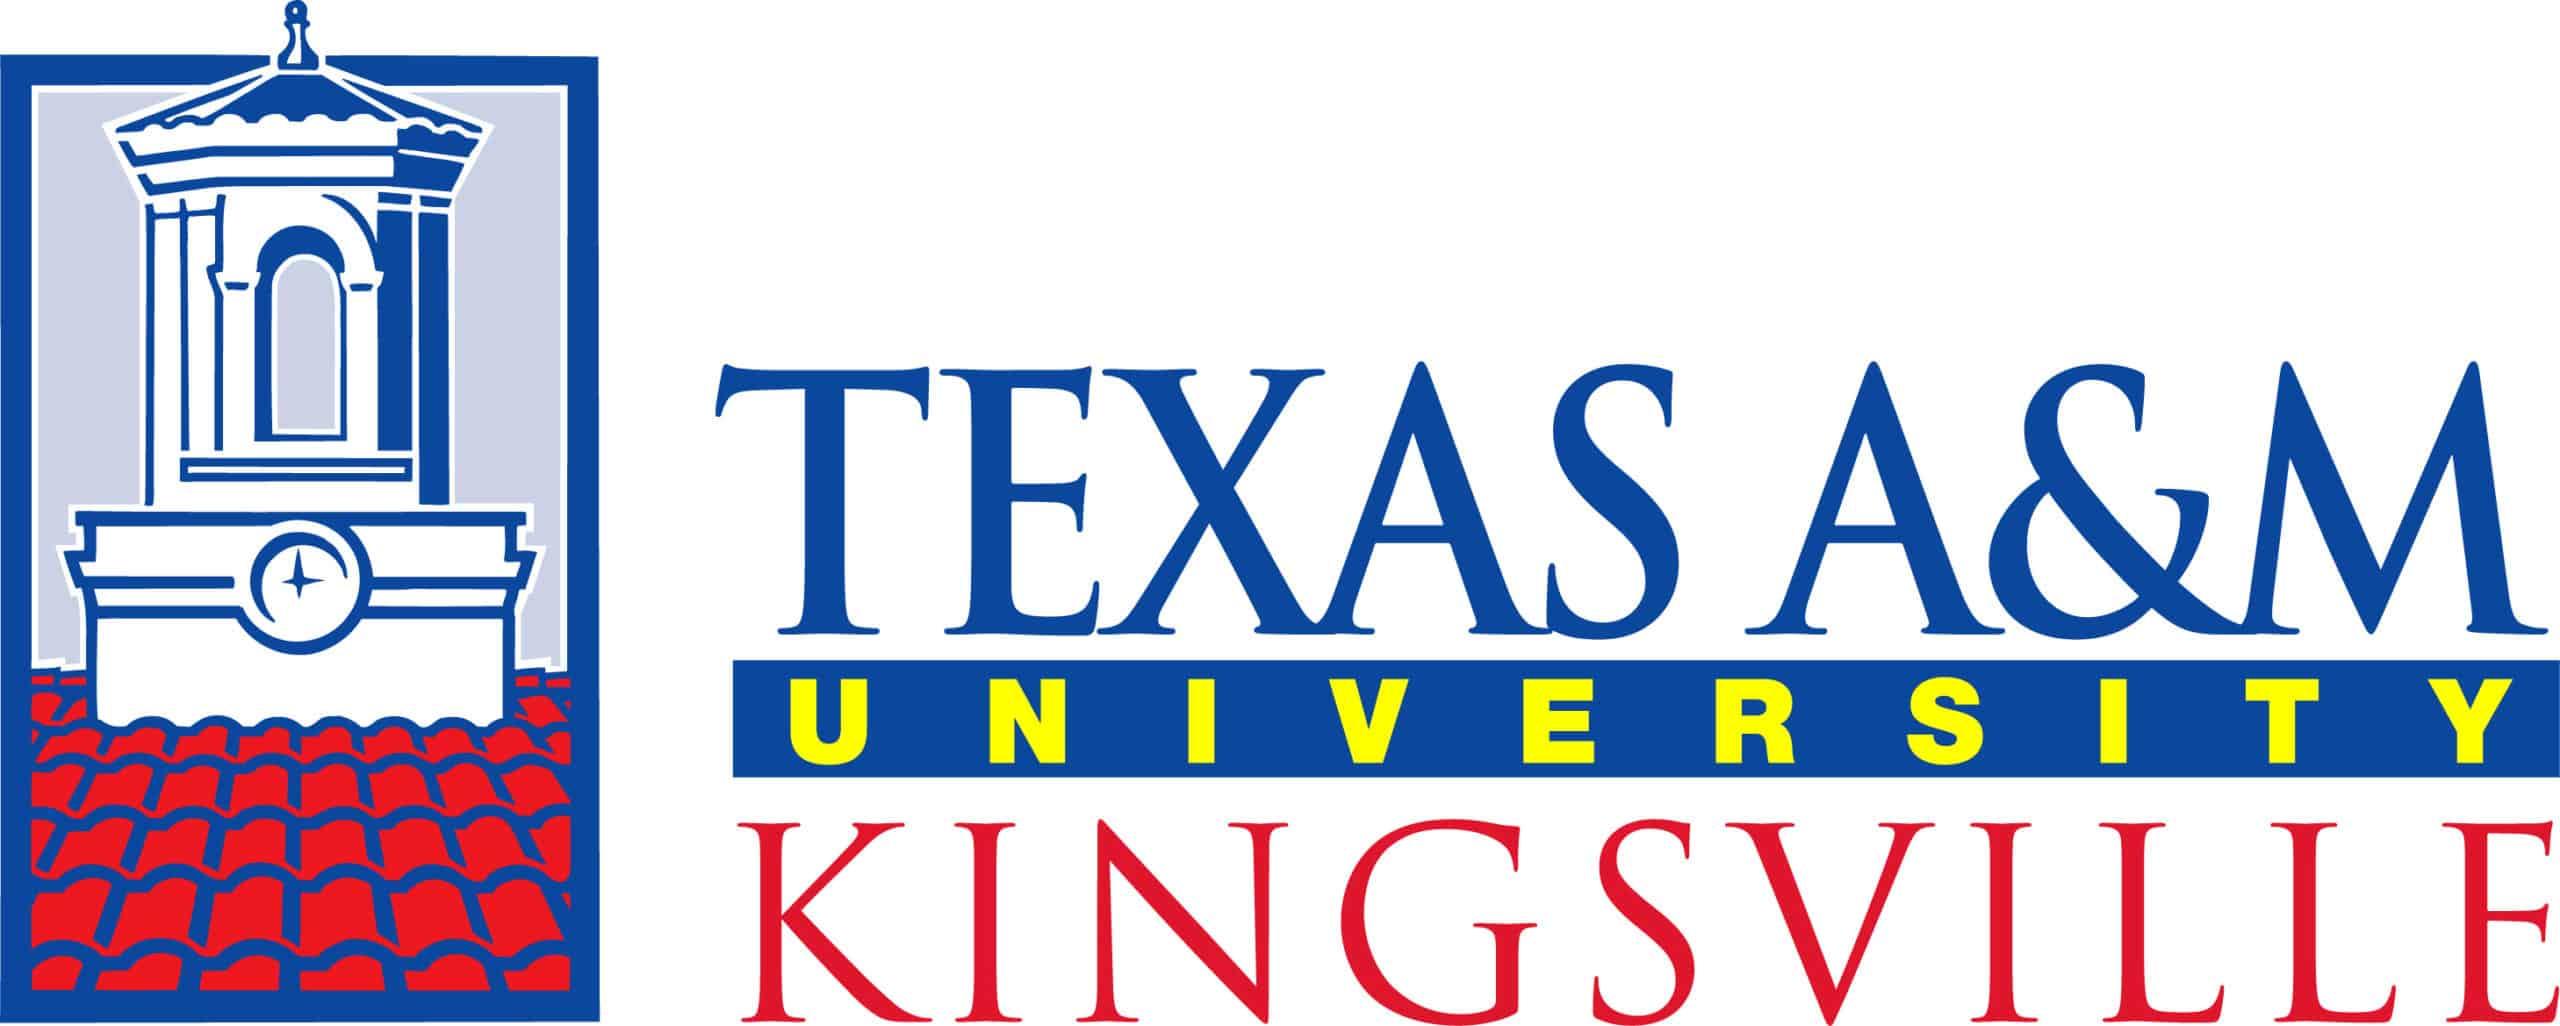 Texas AM University Kingsville logo